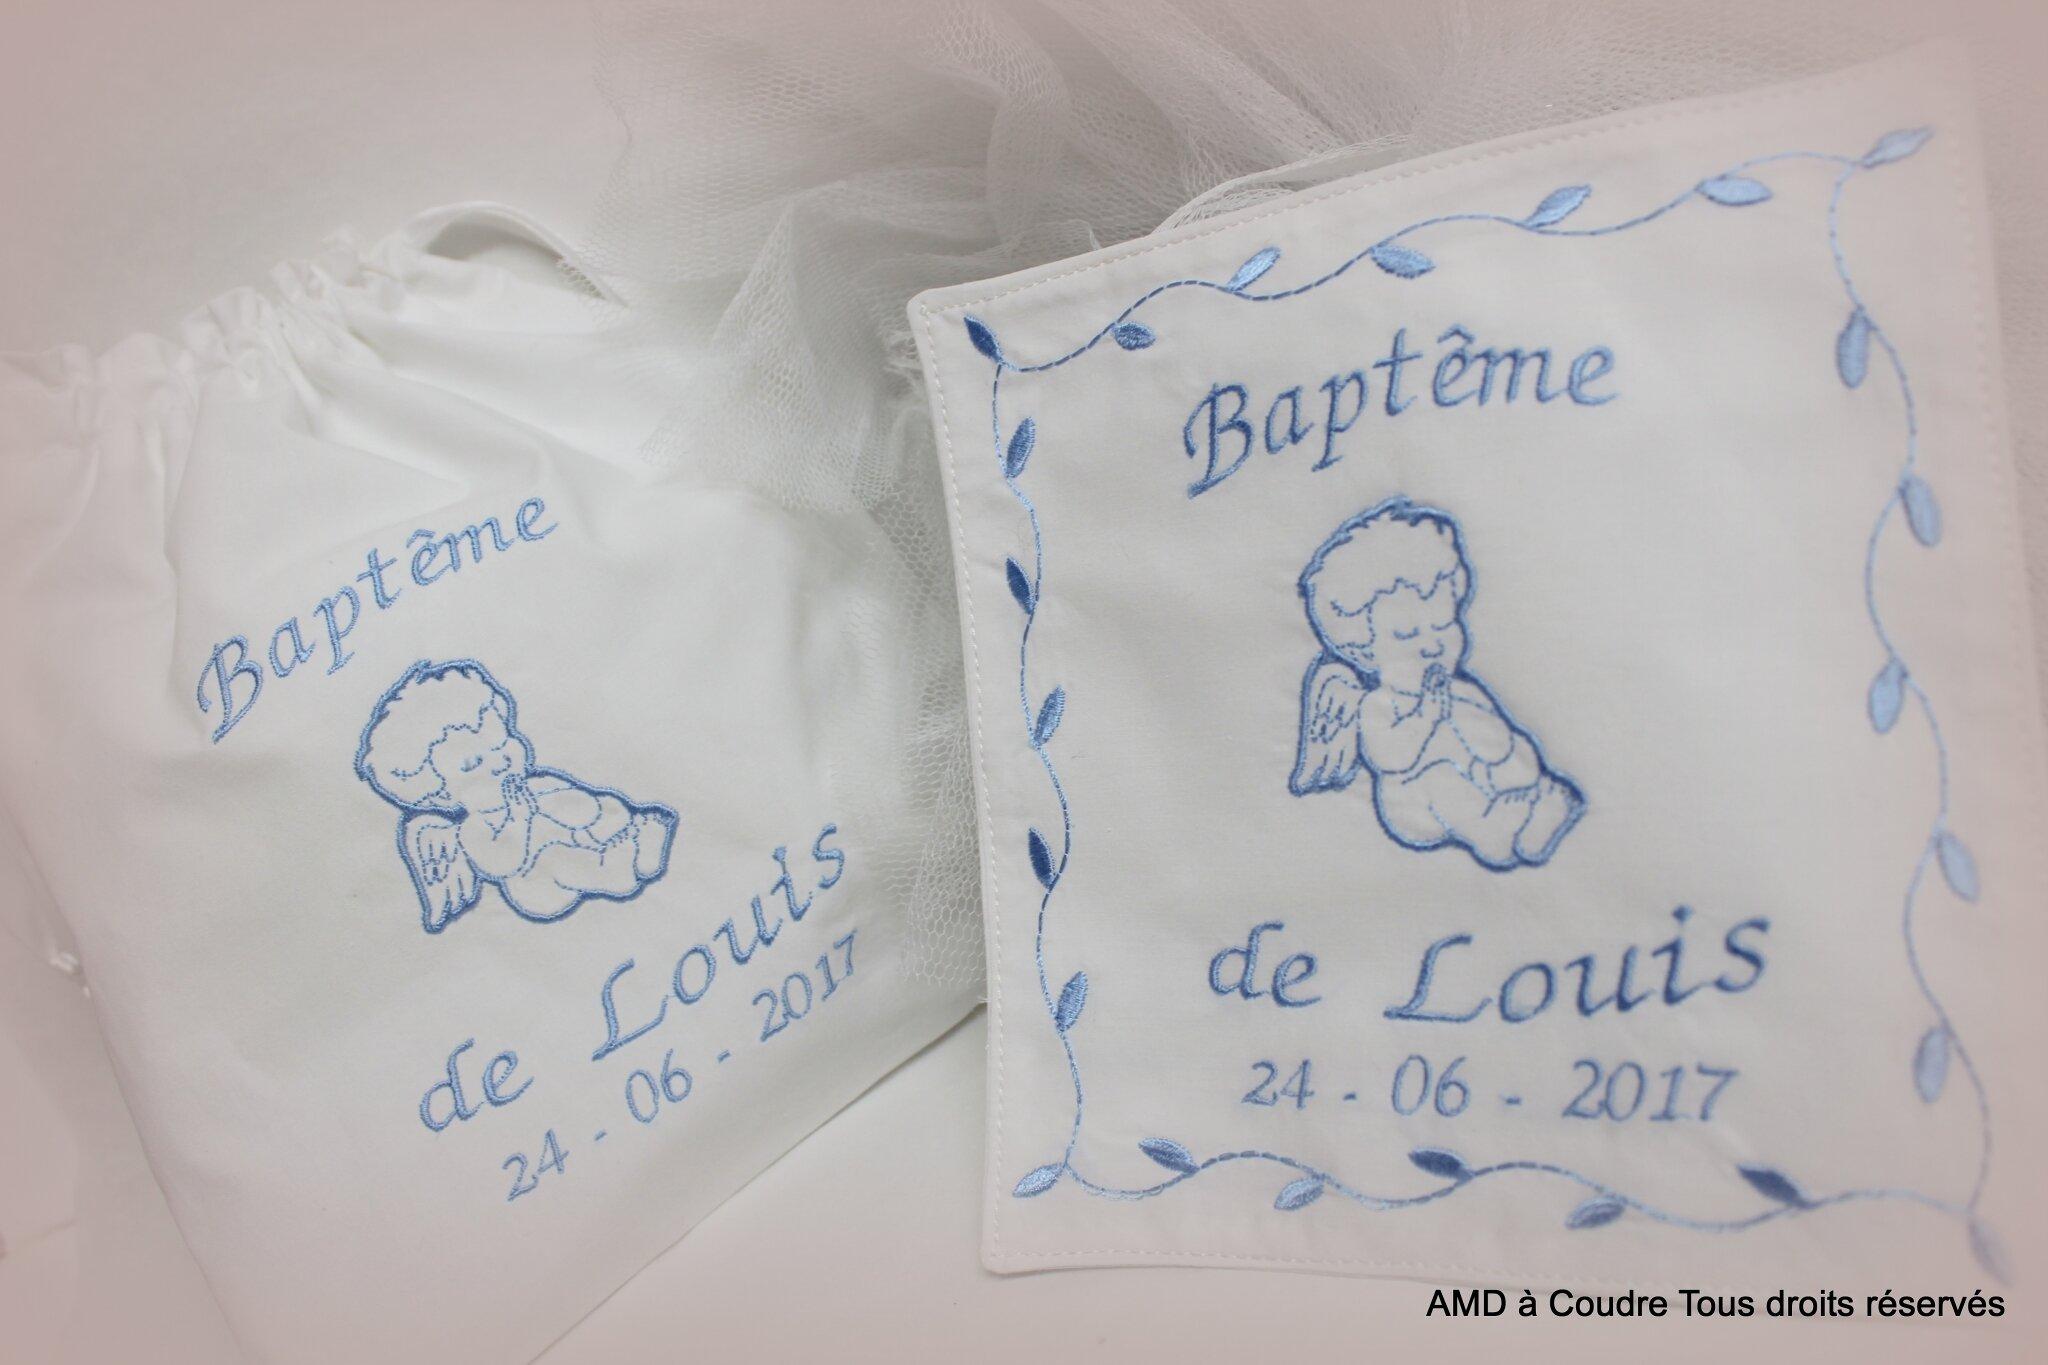 Echarpe de bapteme - à broder, site : www.amdacoudre.com